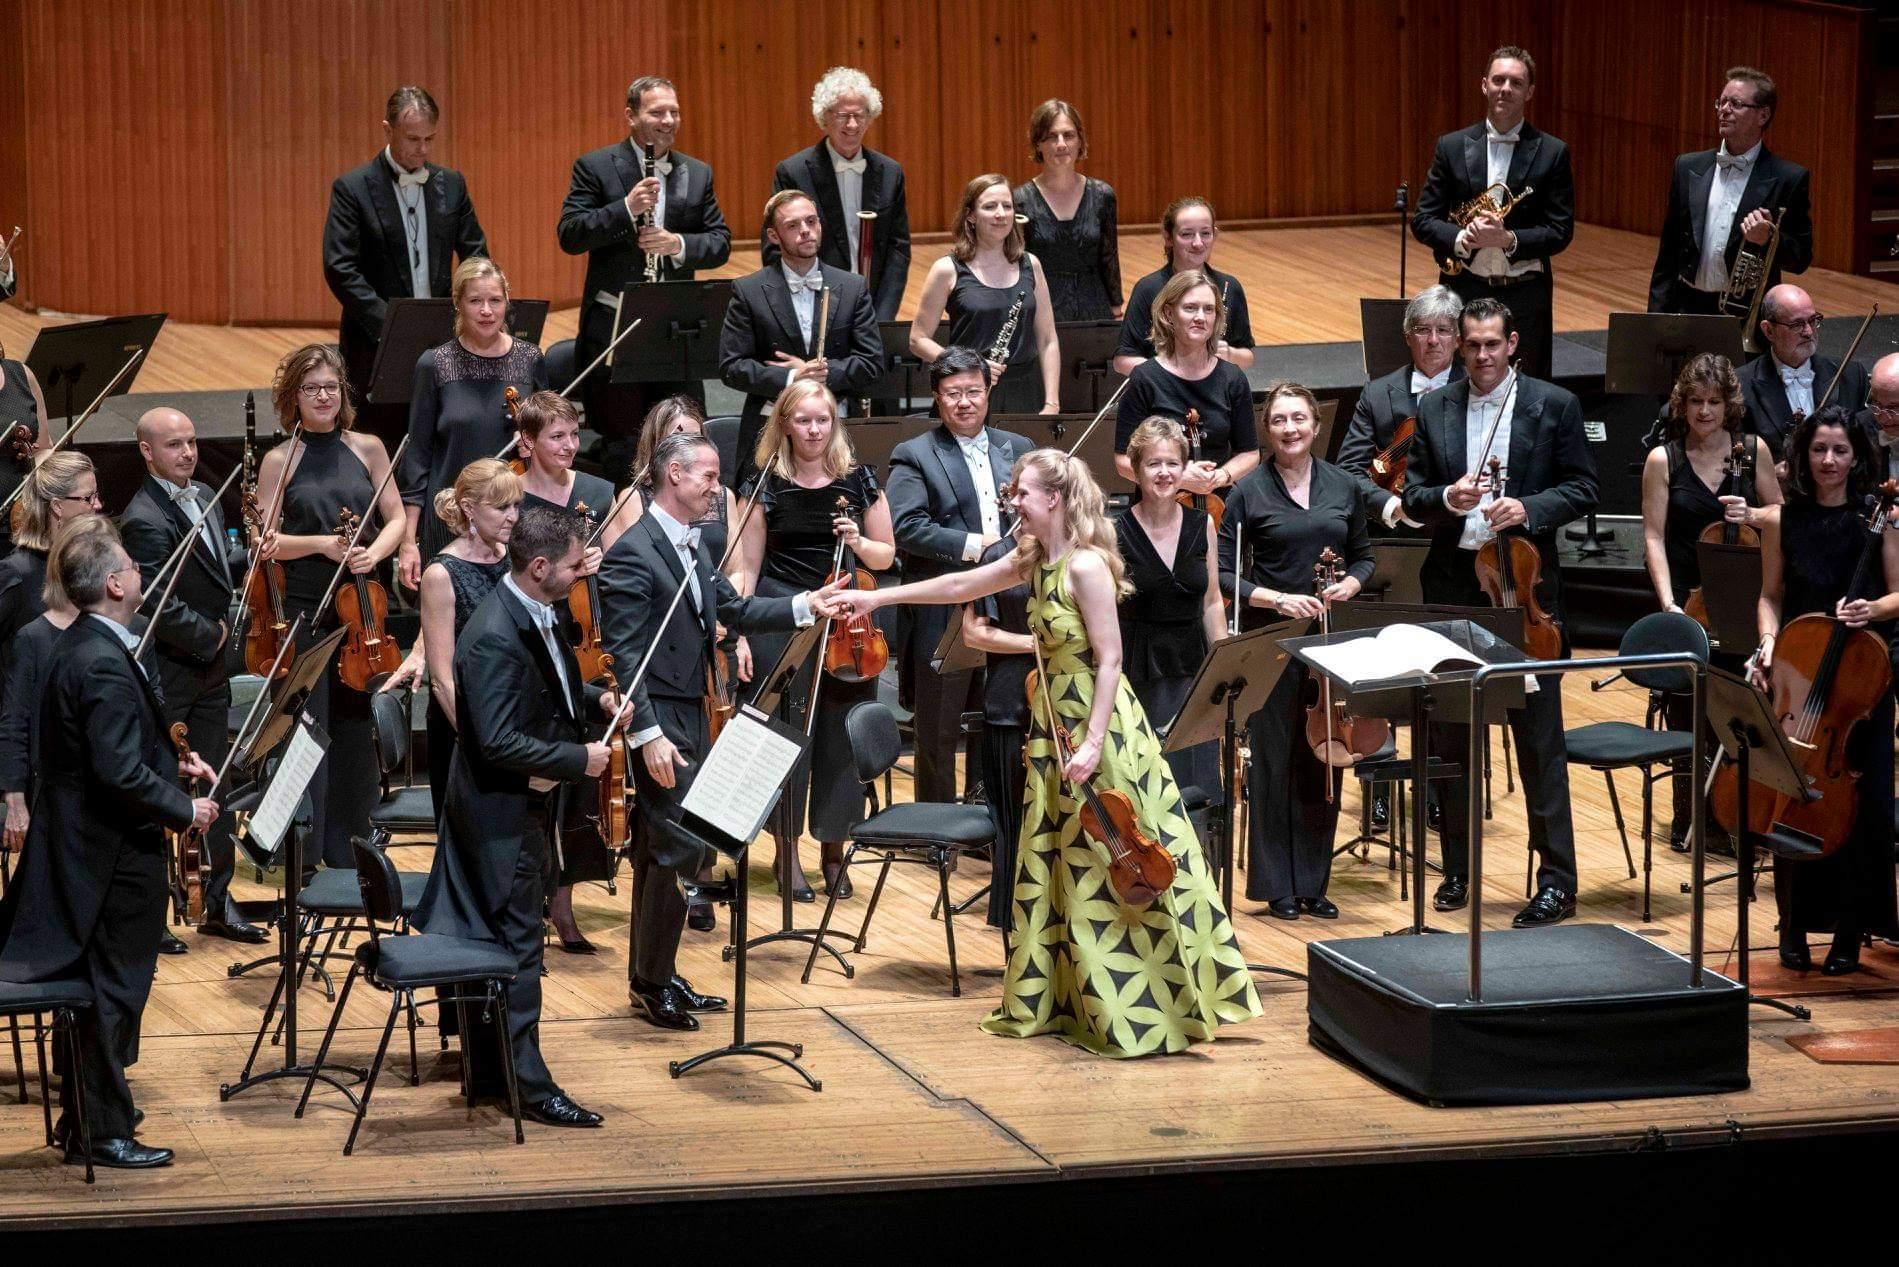 2019 - Australia, Sydney Opera House Sydney Symphony, Alexander Shelley Copyright Daniela Testa (2)